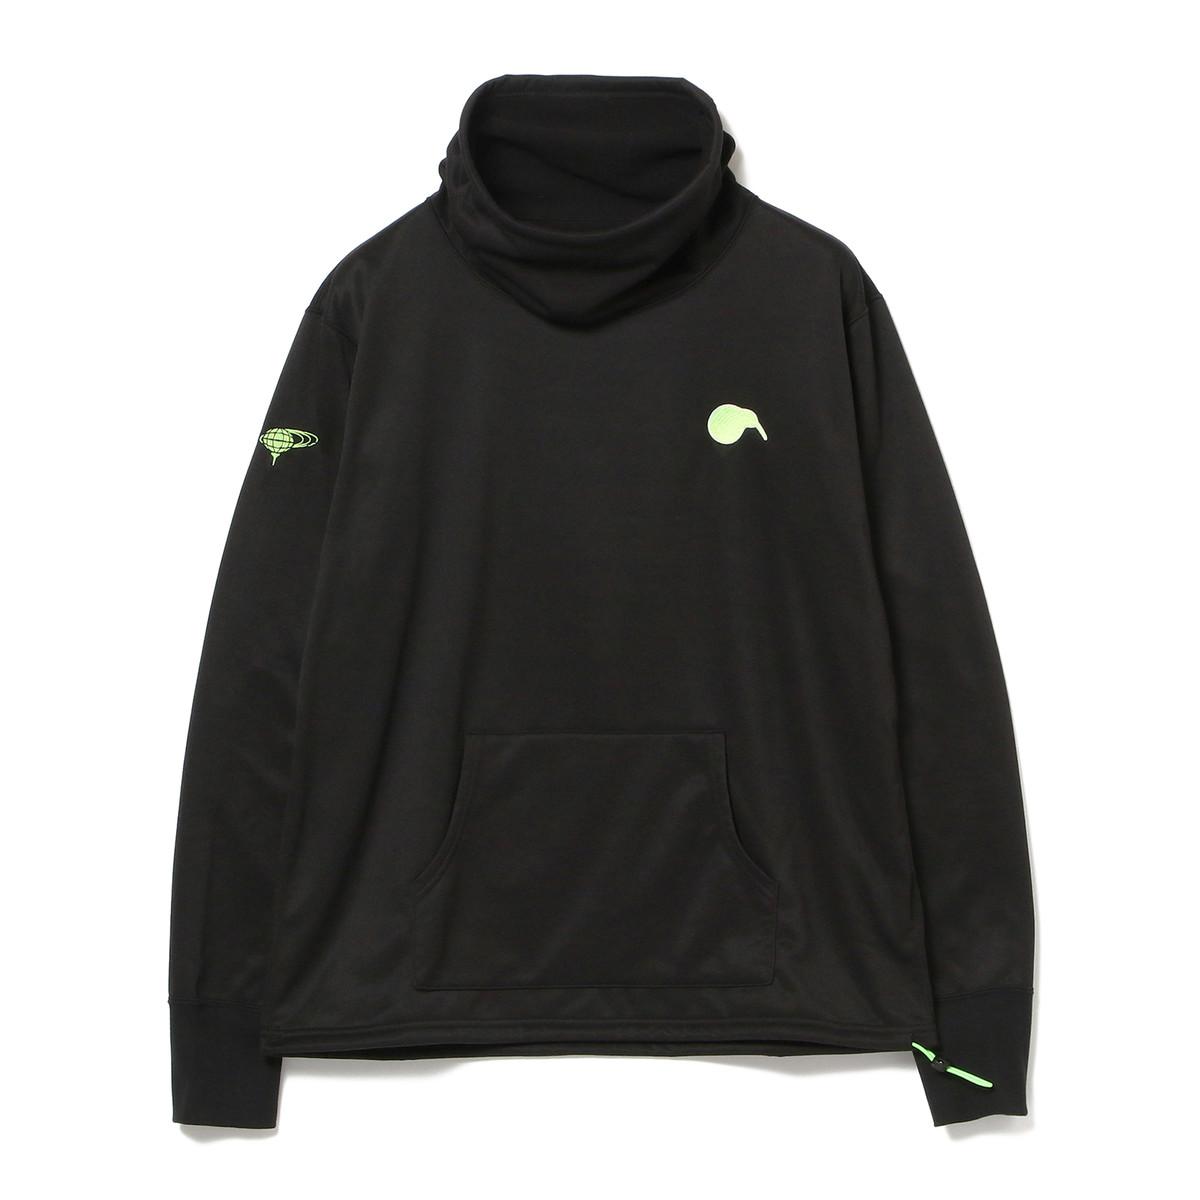 KIWI&Co.× BEAMS GOLF 別注 オフタートル プルオーバー ジャケット